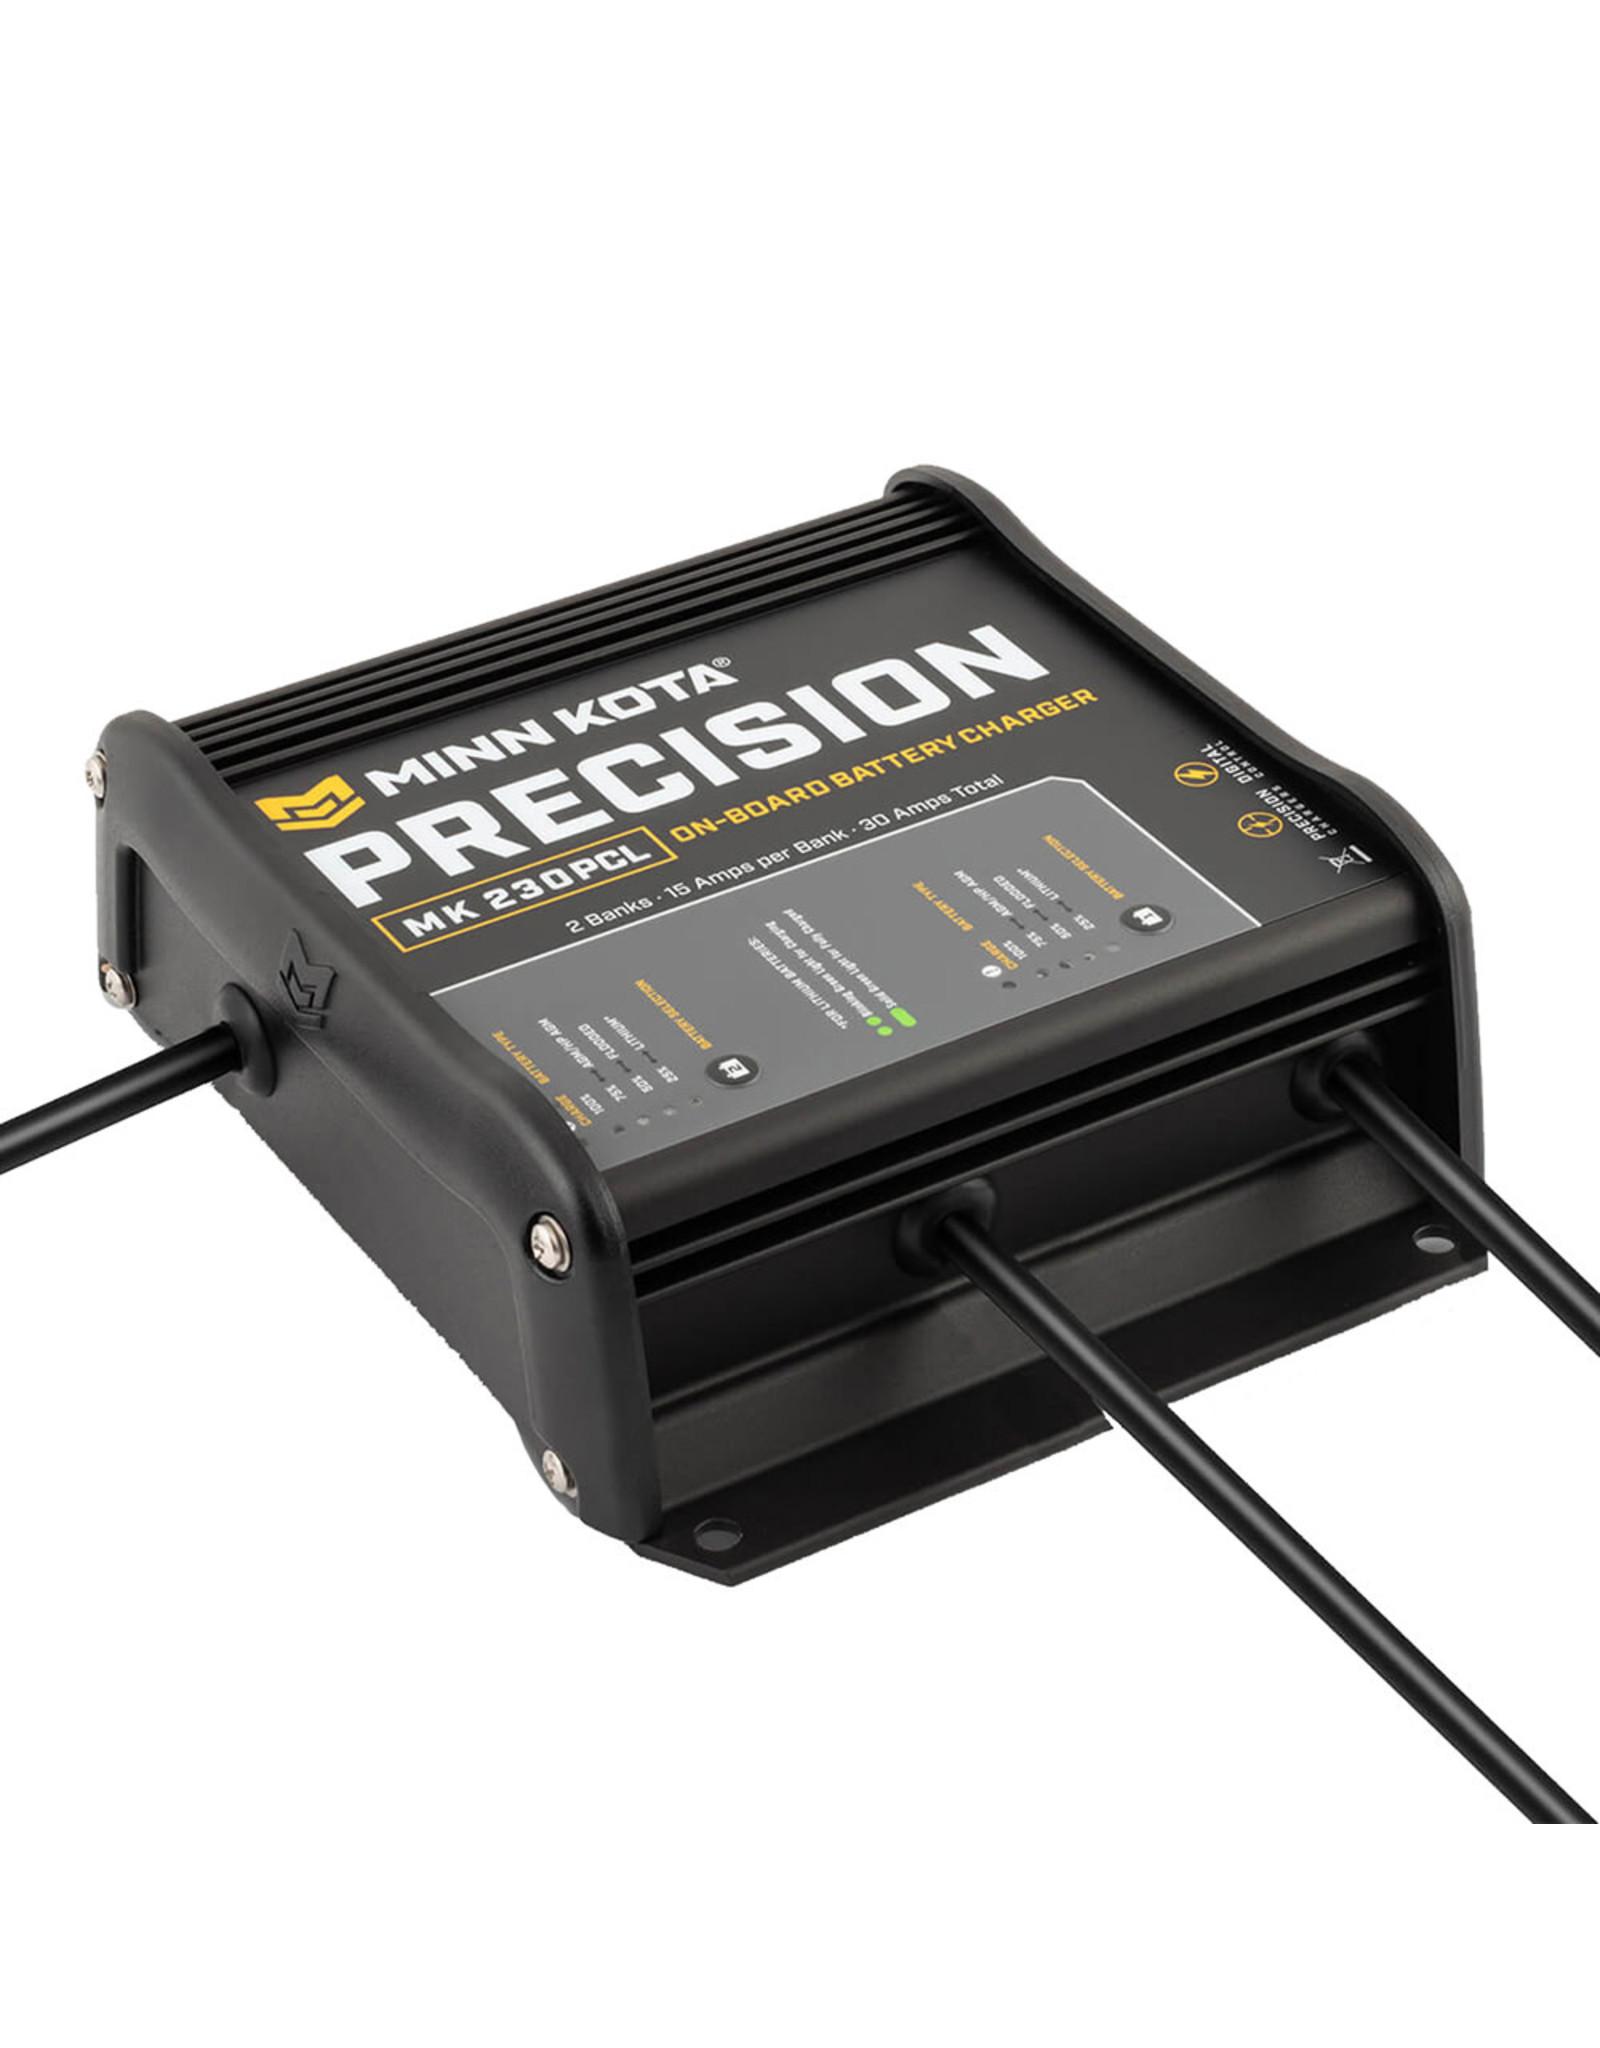 Minn Kota Precision Charger MK-230 PCL 2 Bank x 15 AMP LI Optimized Charger